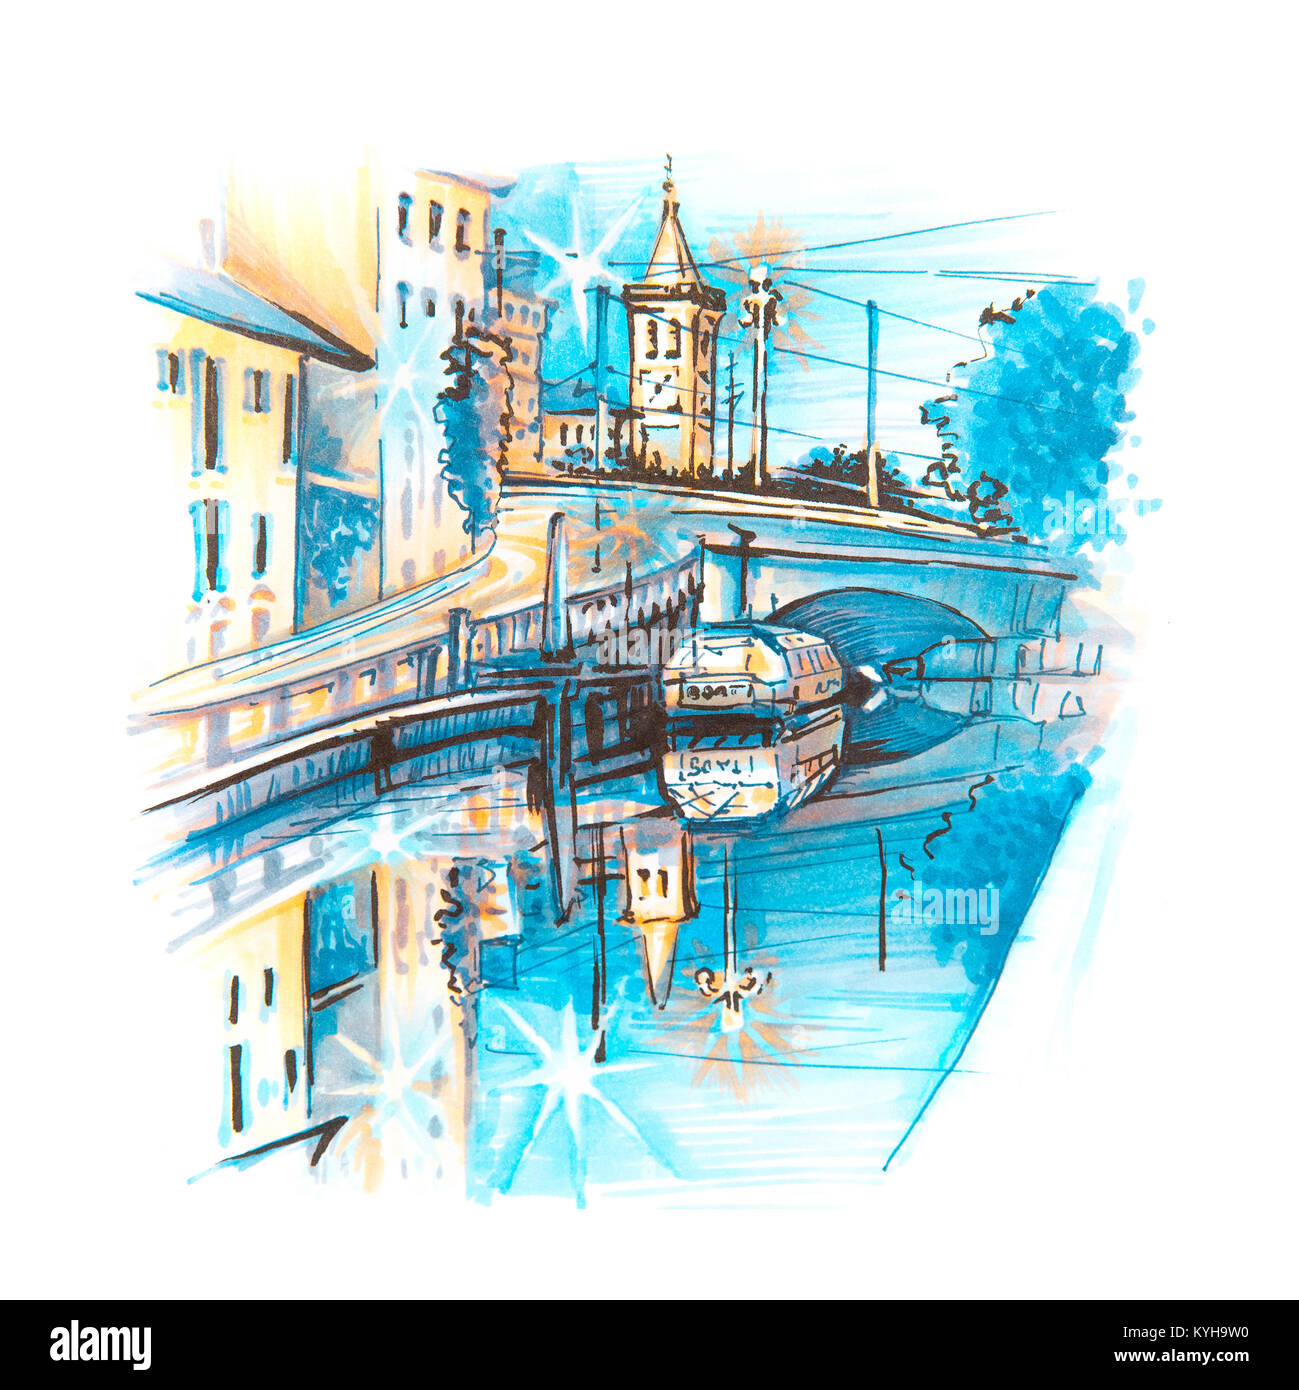 Naviglio Grande canal in Milan, Lombardia, Italy - Stock Image